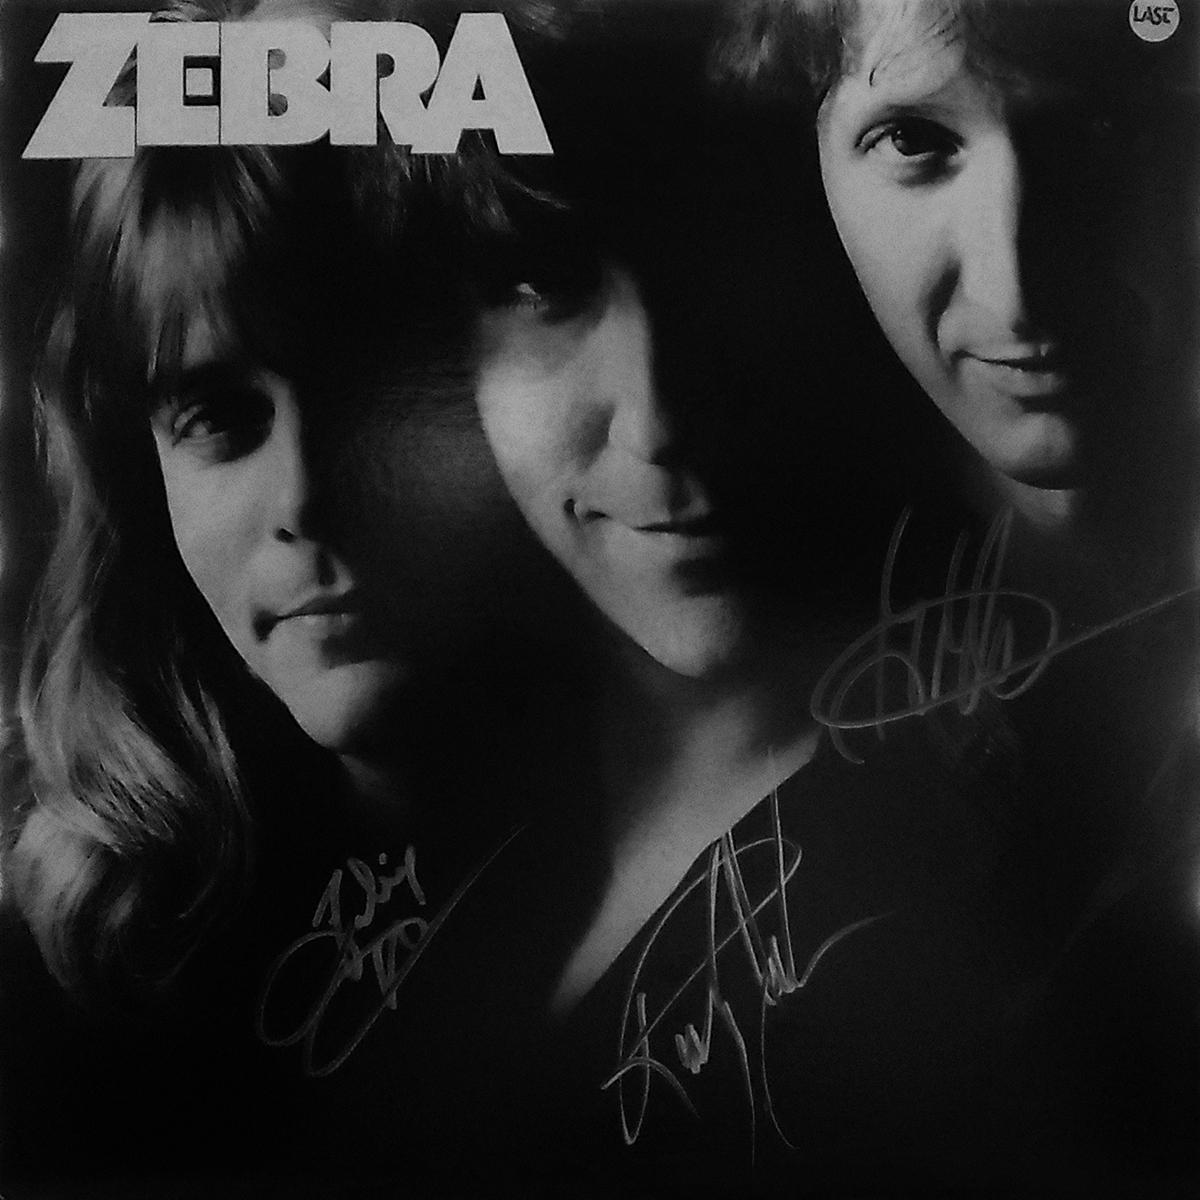 LP - ZEBRA